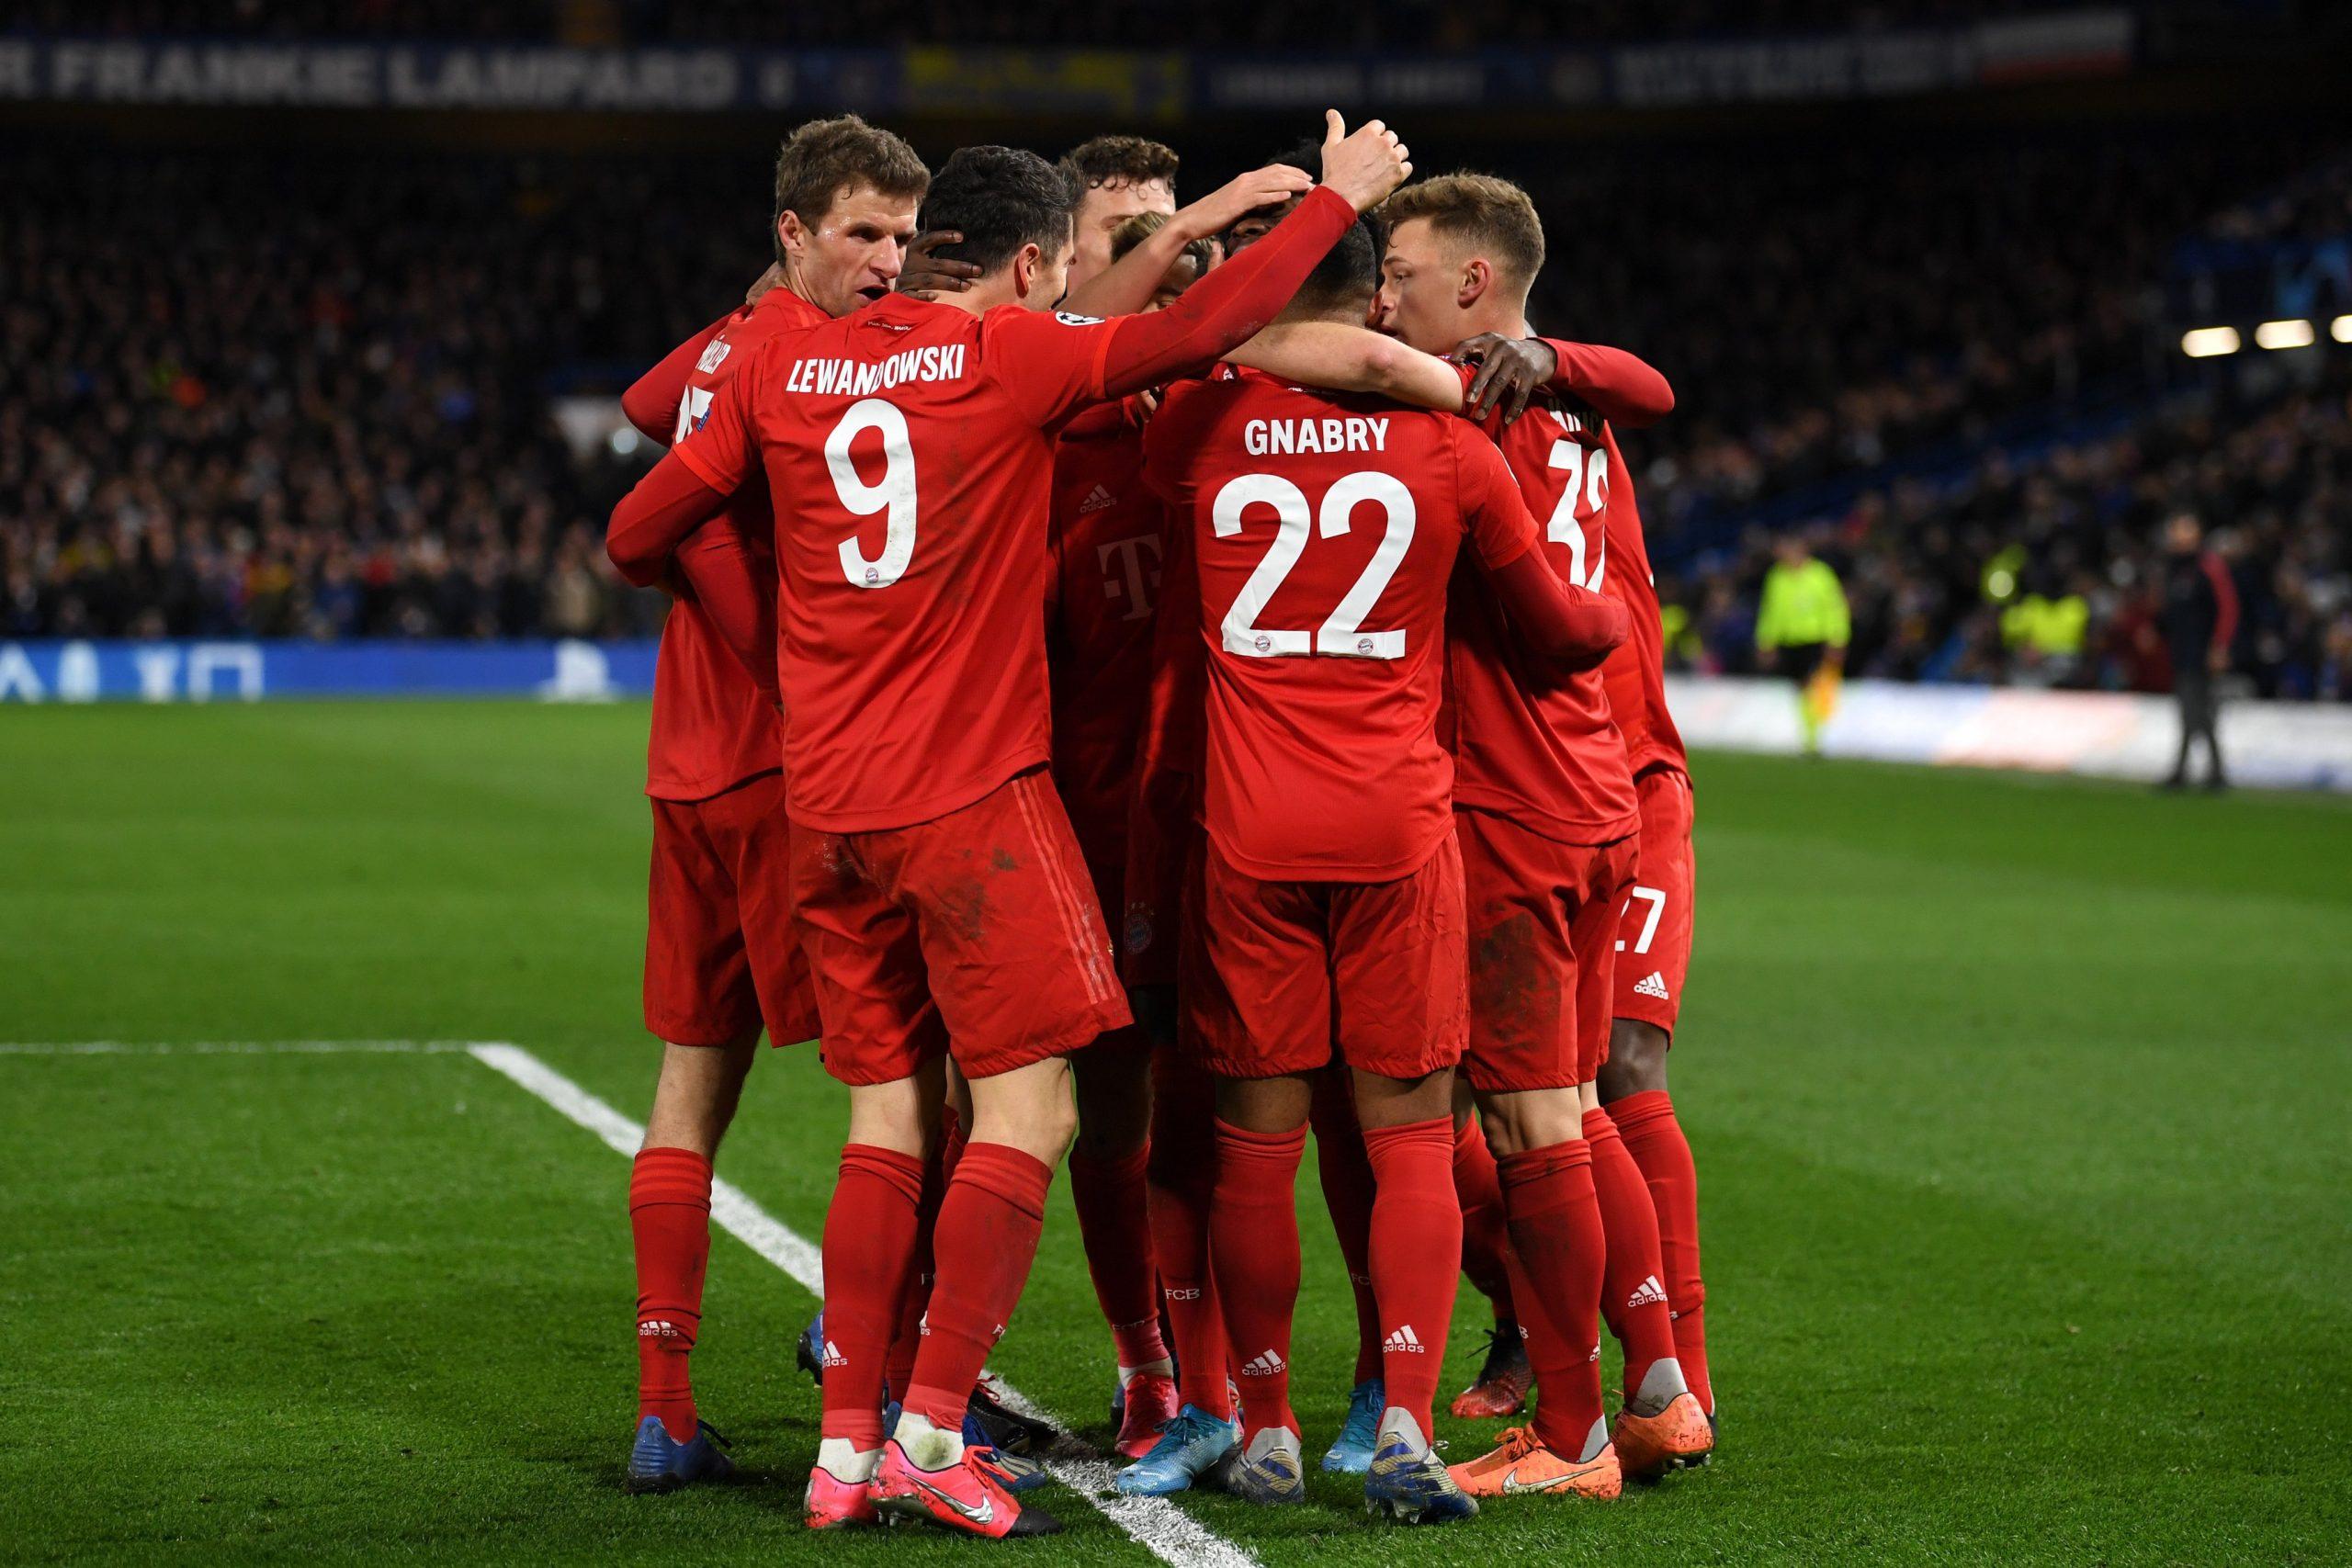 Dupla Lewa-Gnabry é crucial na vitória do Bayern sobre o Chelsea